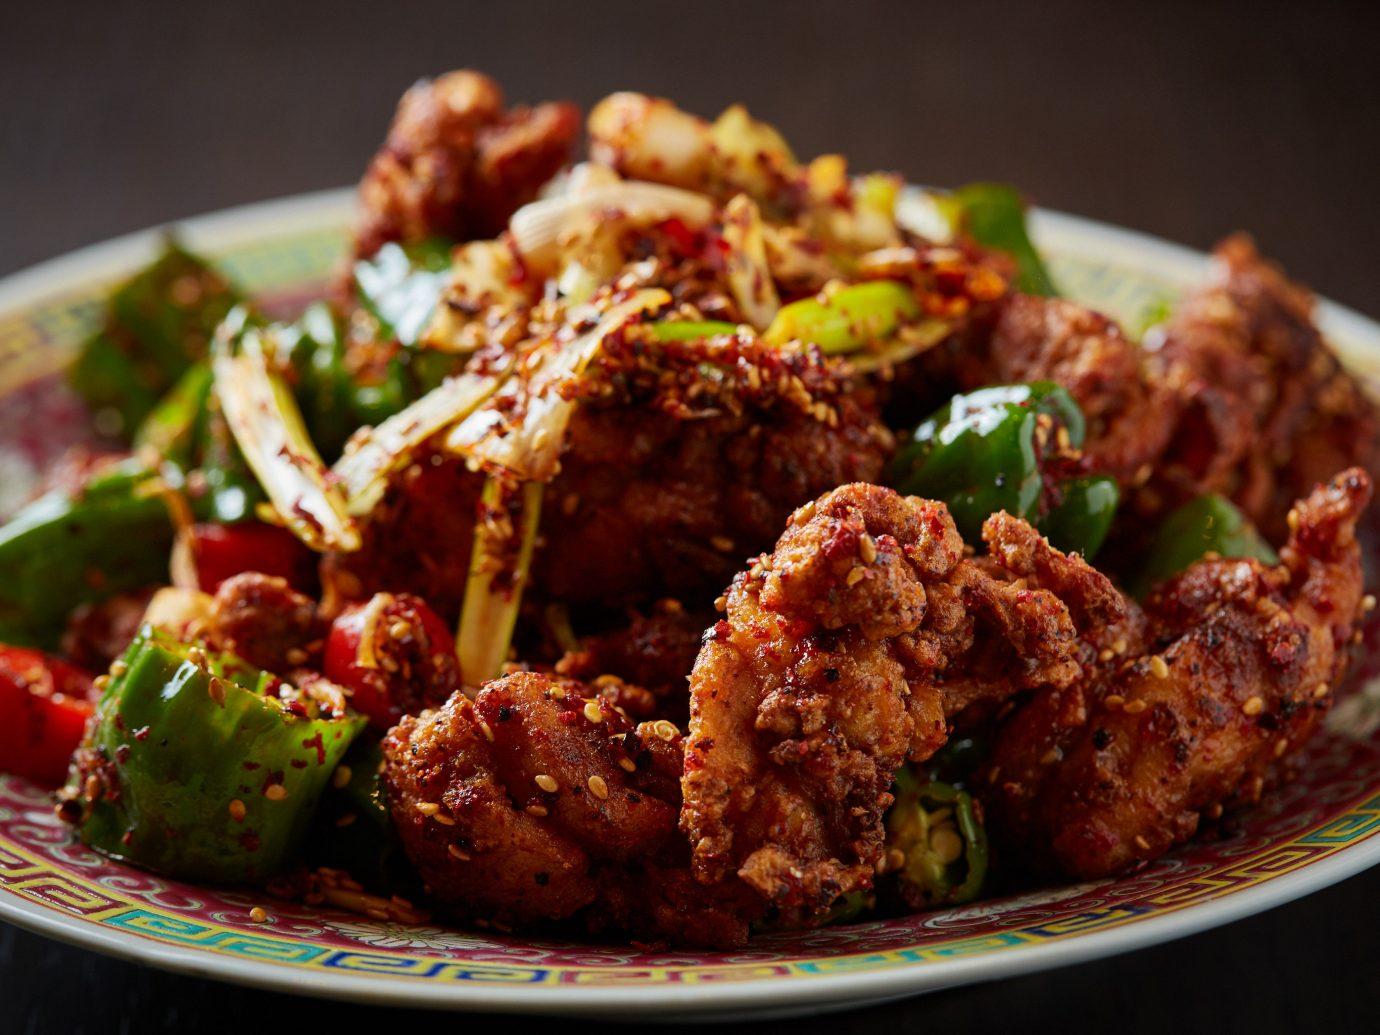 Trip Ideas food plate dish fried food meat cuisine produce asian food vegetable tandoori chicken thai food curry southeast asian food side dish jambalaya